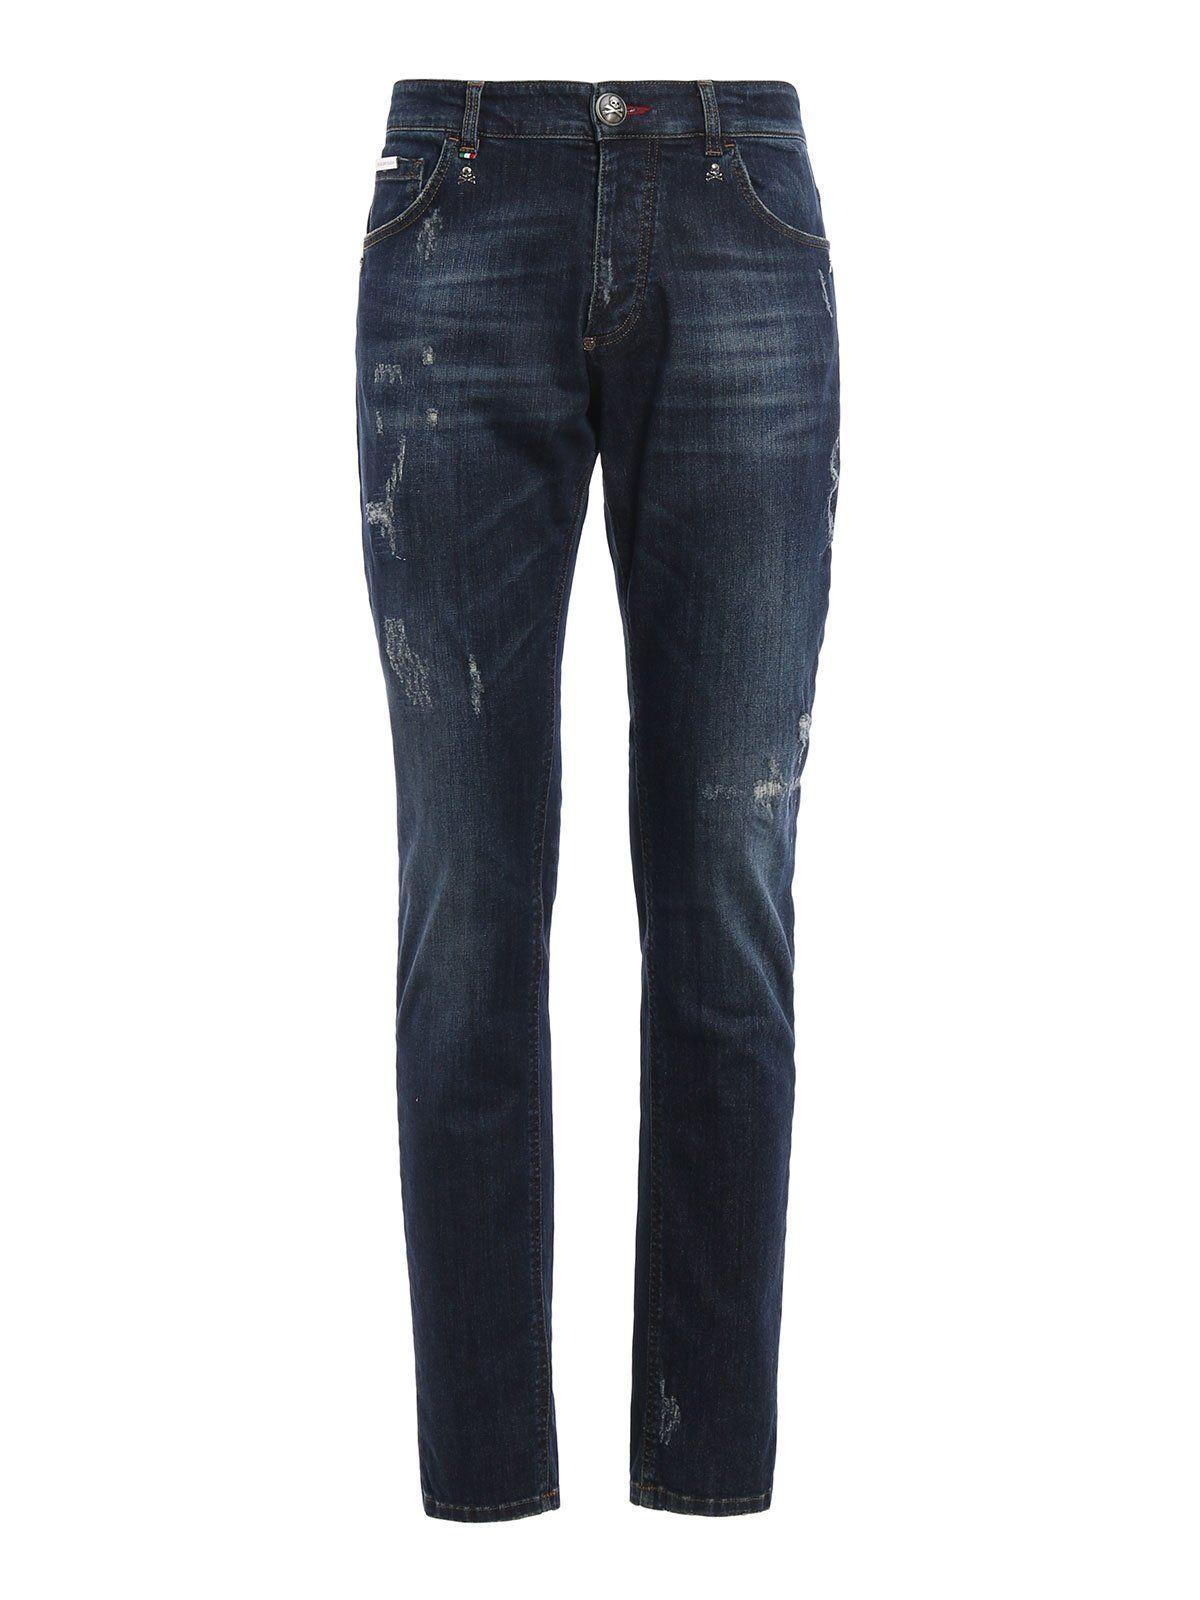 philipp plein philipp plein akio jeans blue men 39 s jeans italist. Black Bedroom Furniture Sets. Home Design Ideas